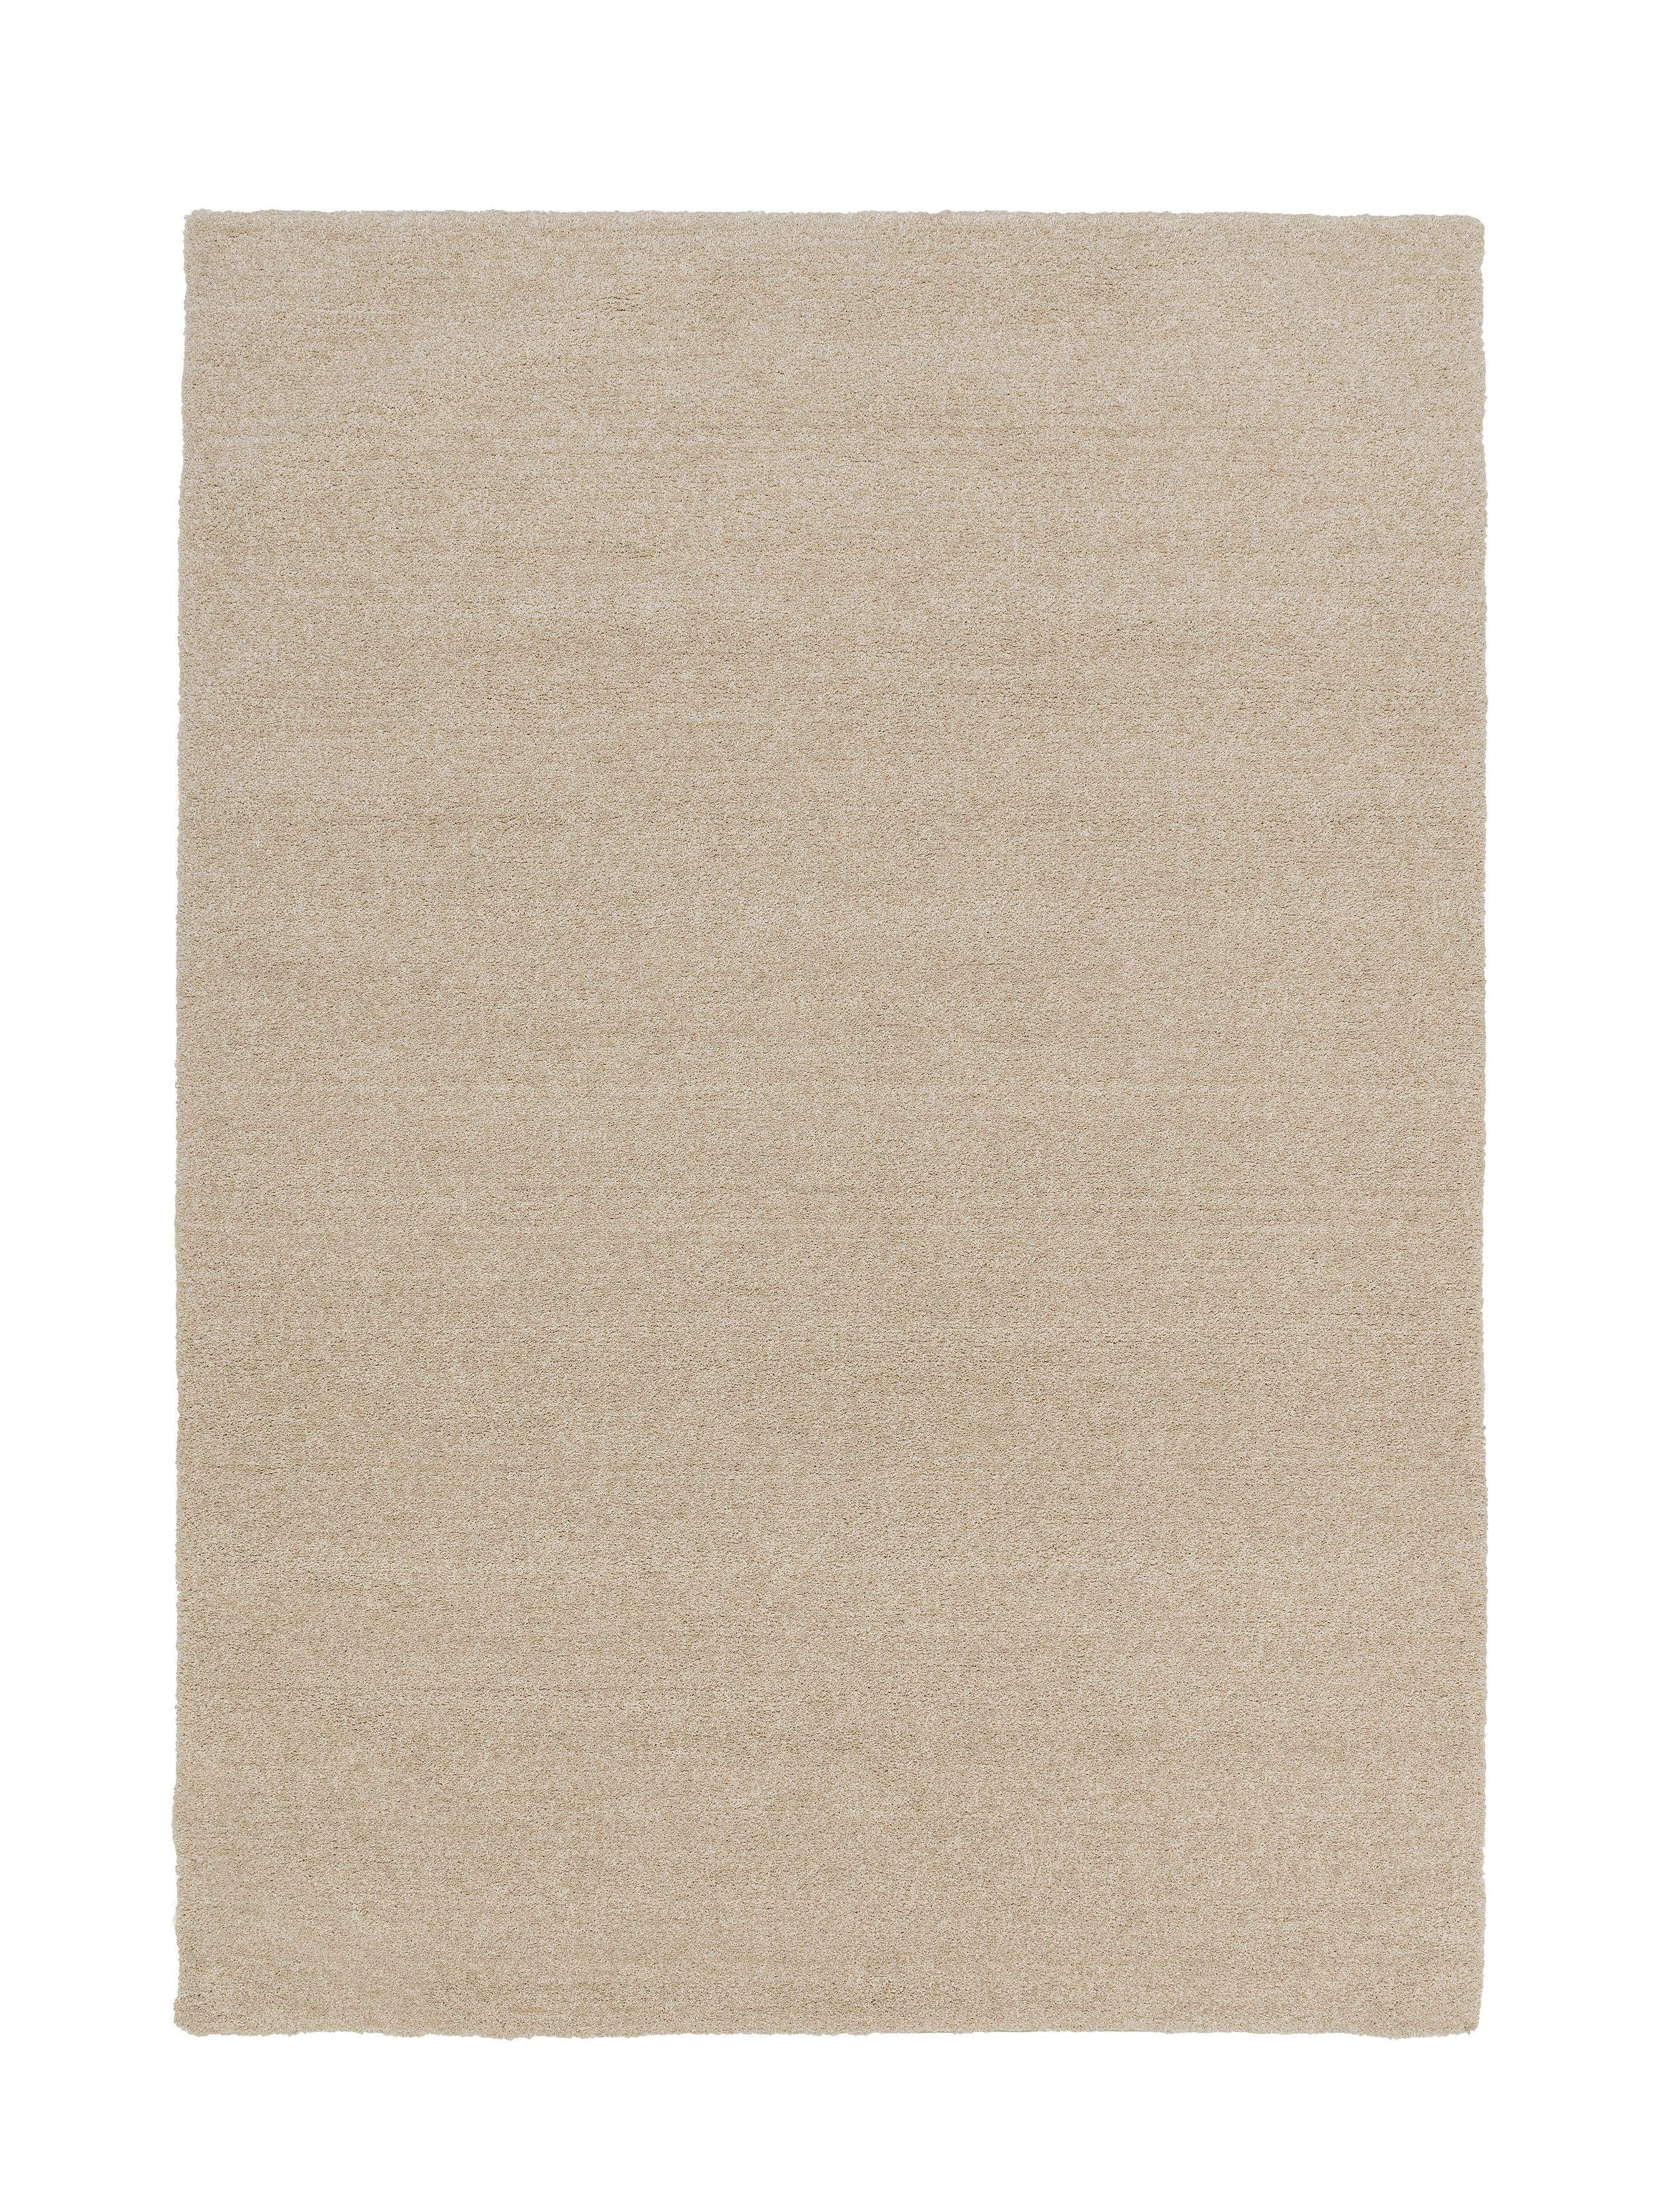 Astra - Golze koberce Kusový koberec Livorno 160000 Mottled Creme - 200x300 cm